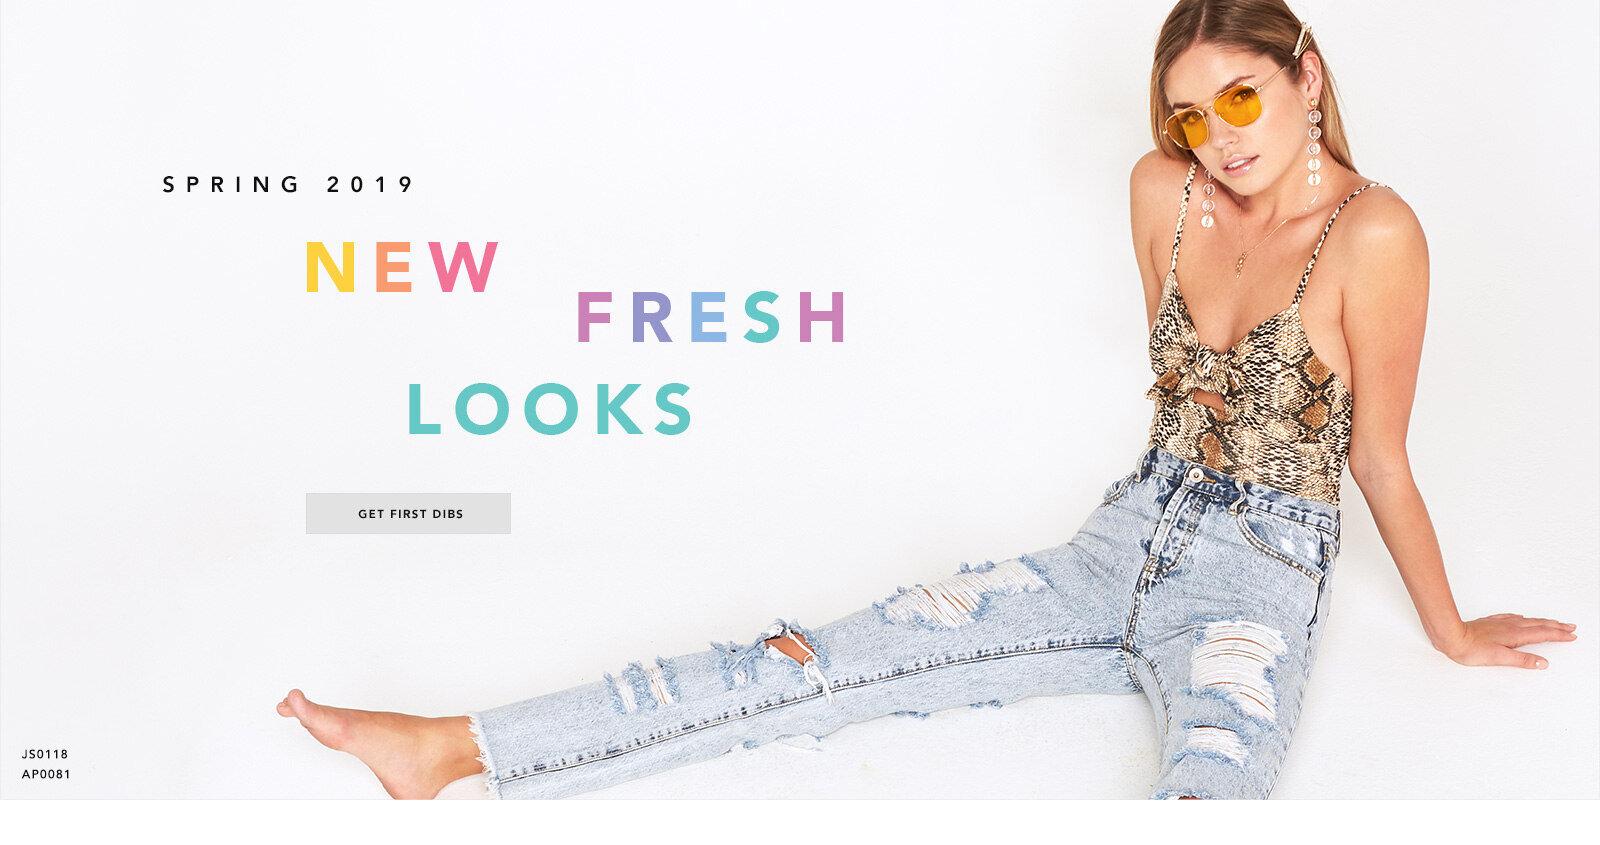 Spring 2019 - New Fresh Looks